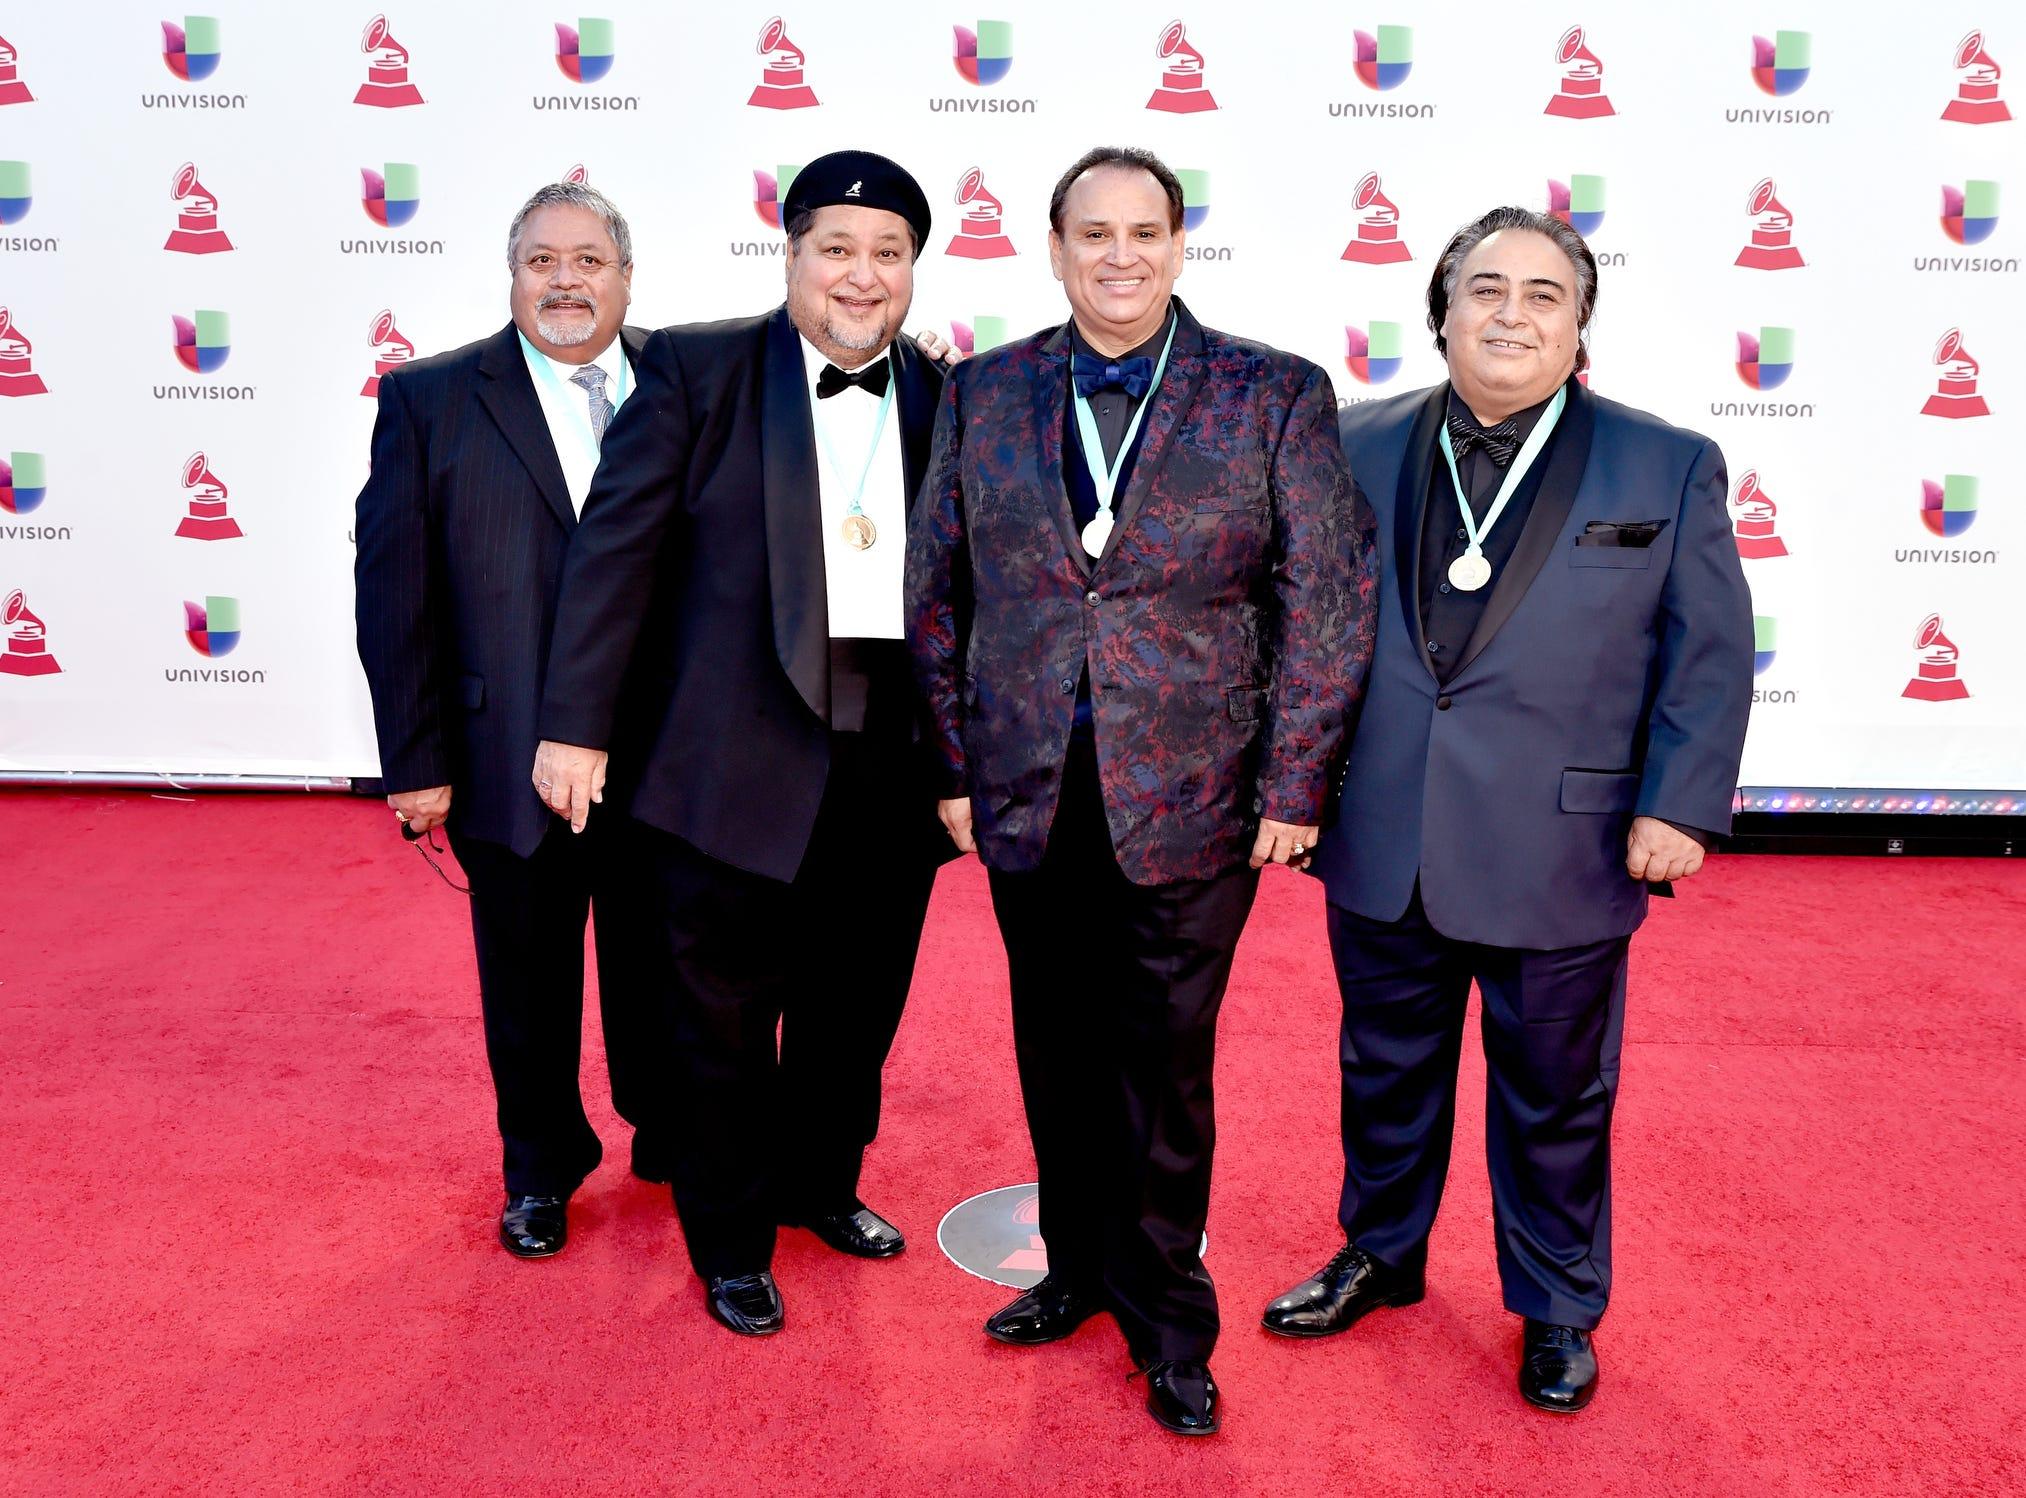 Members of Roger Velasquez and The Latin Legendz